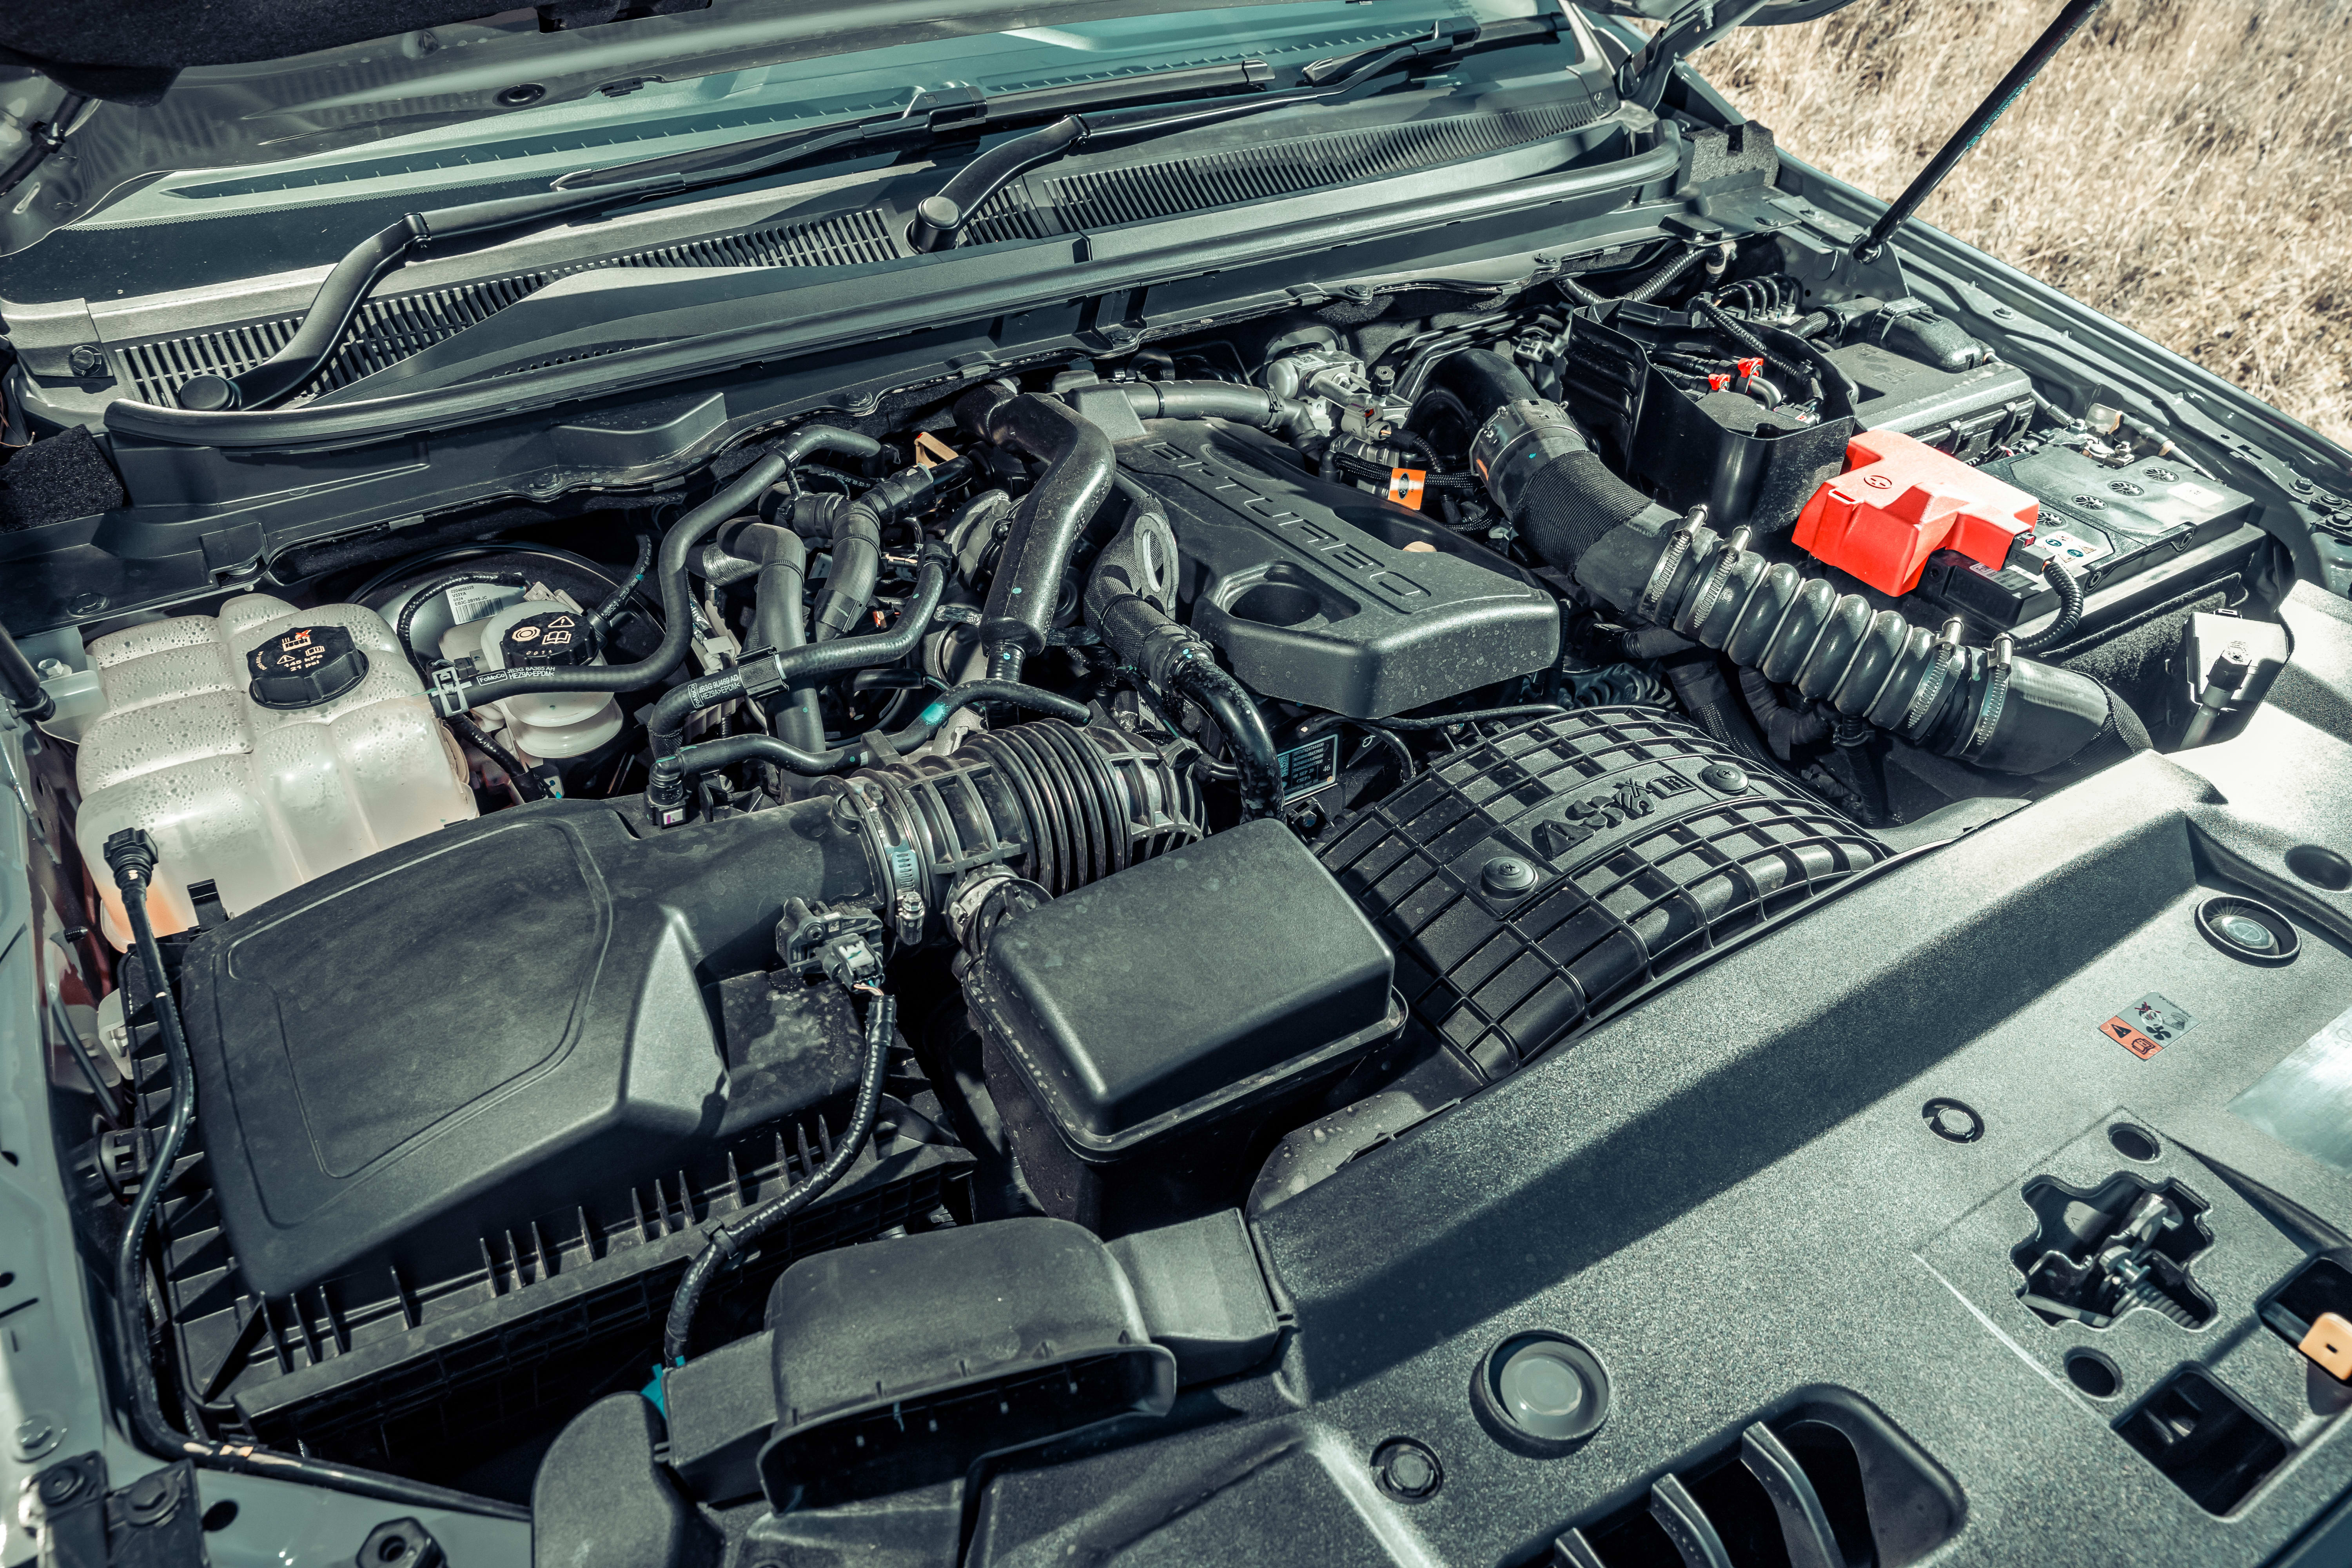 4 X 4 Australia Comparisons 2021 May 21 Ford Ranger FX 4 MAX 9